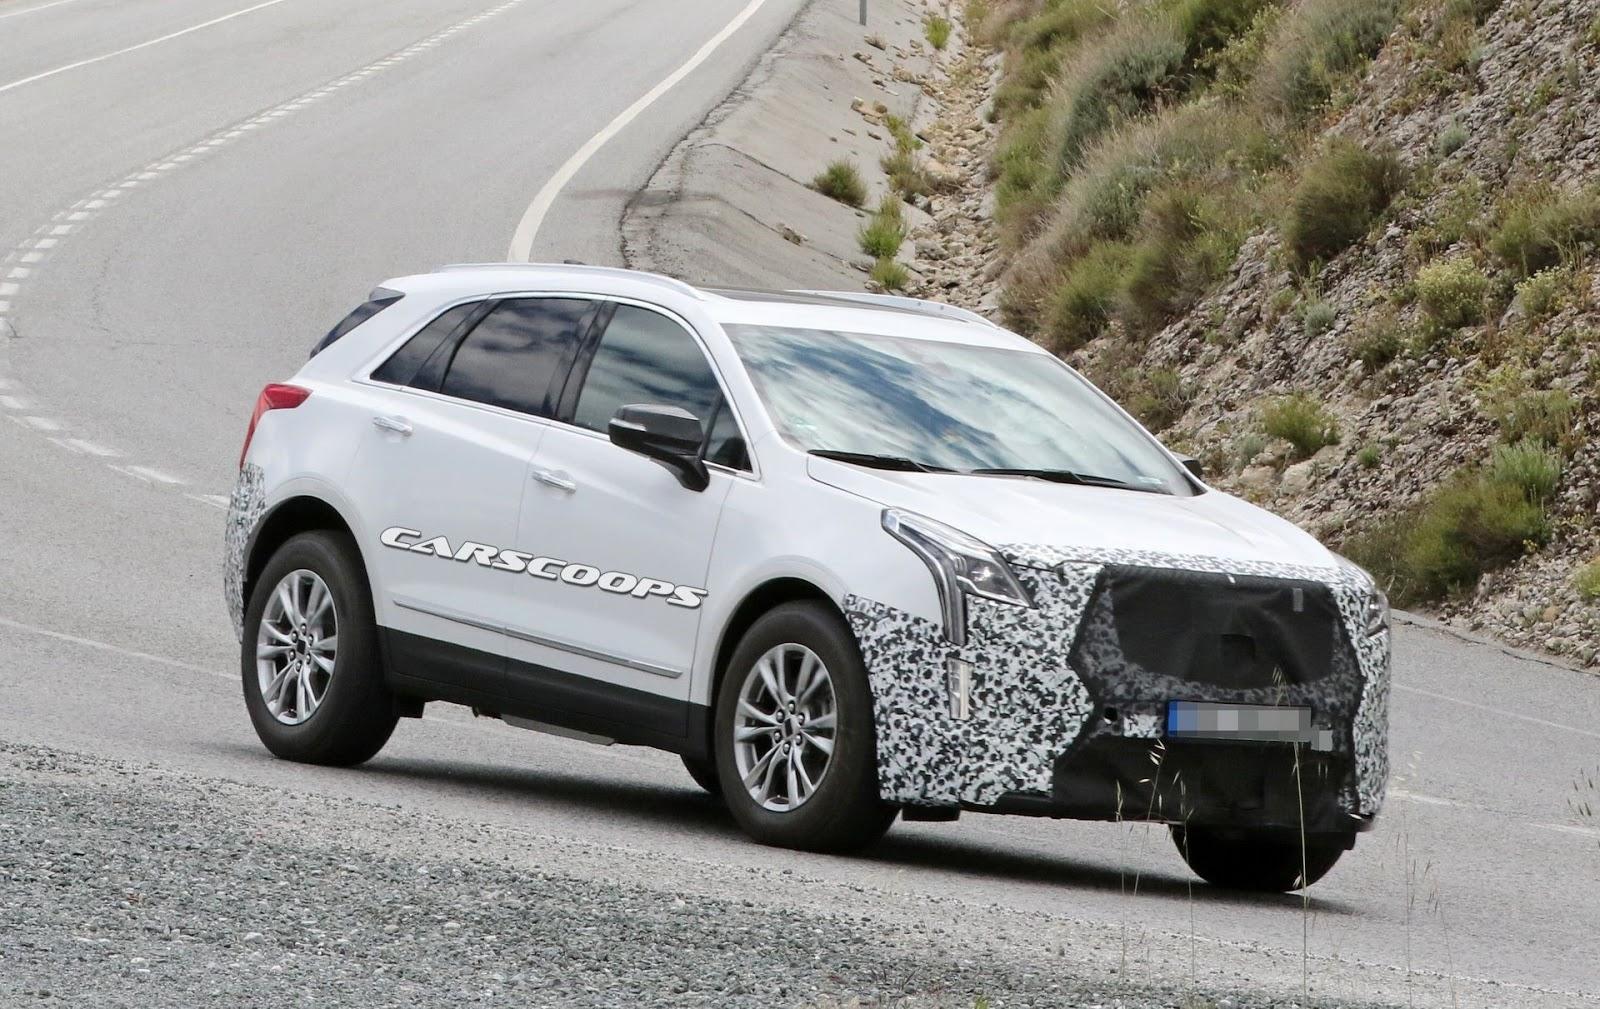 Spy Shots Cadillac Xt5 Research New